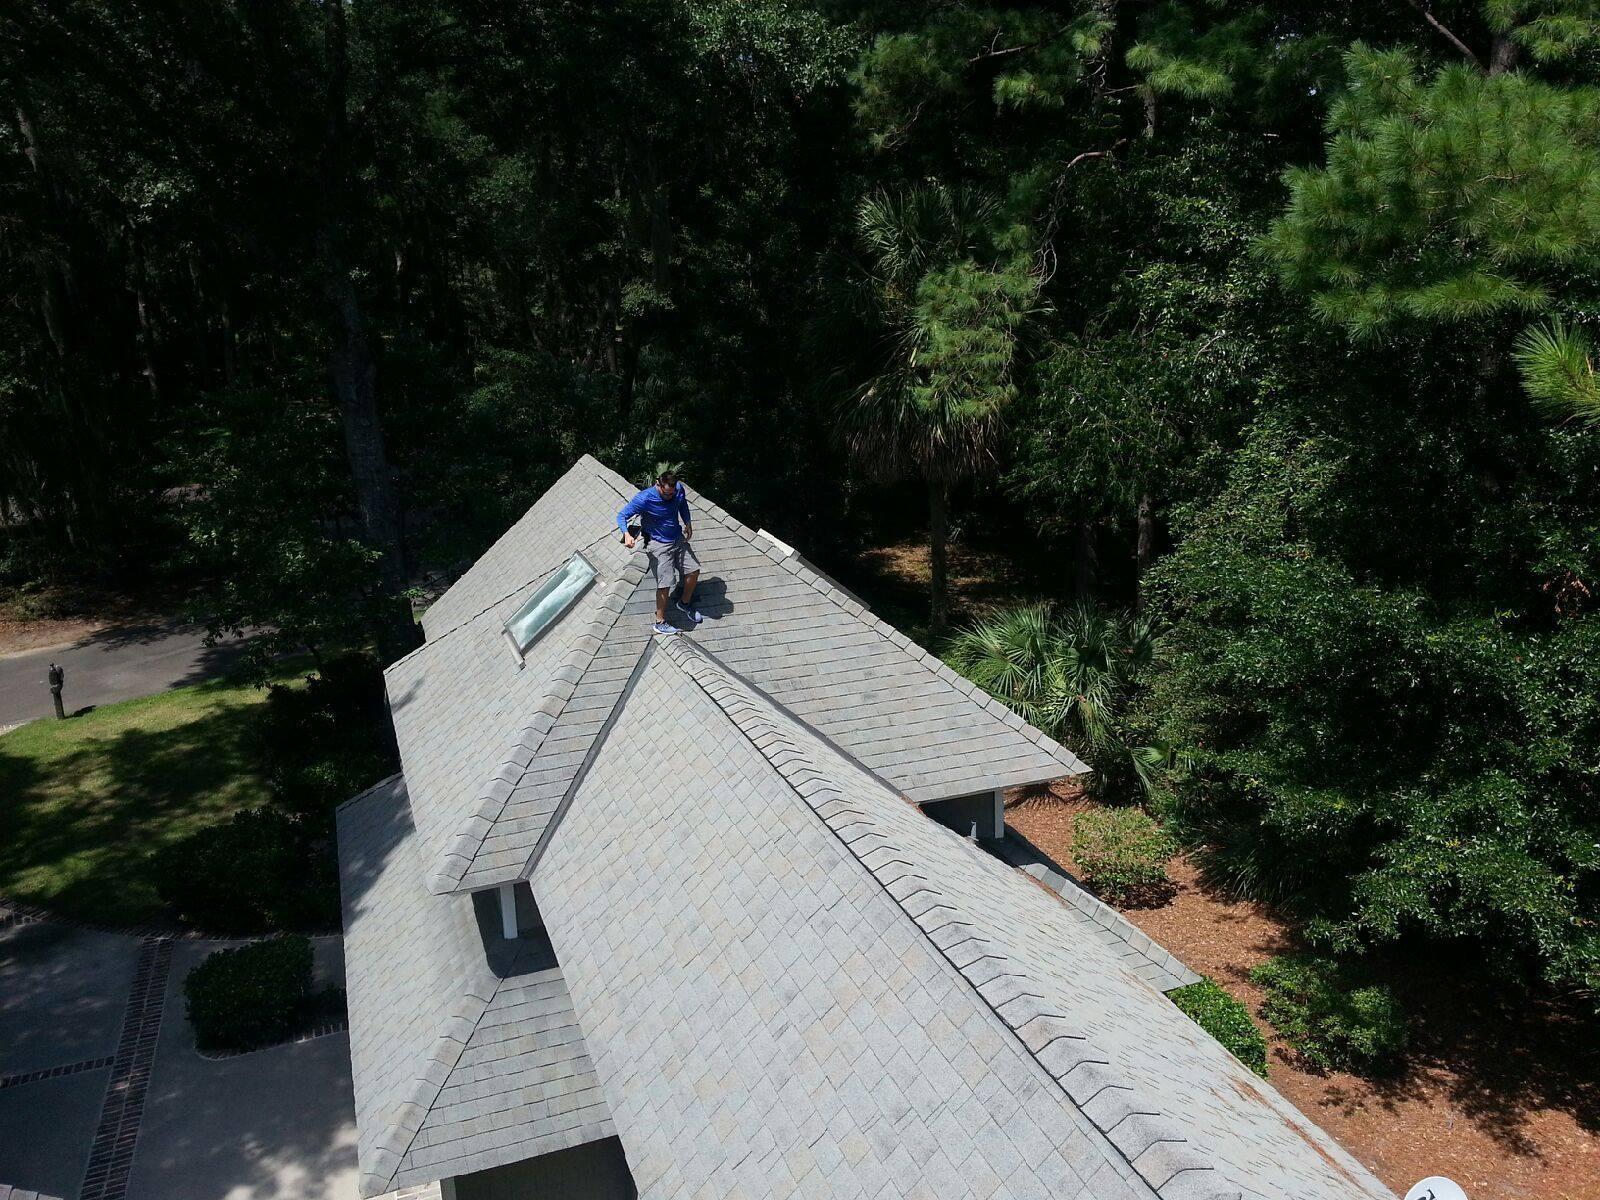 RoofCrafters-Savannah image 66